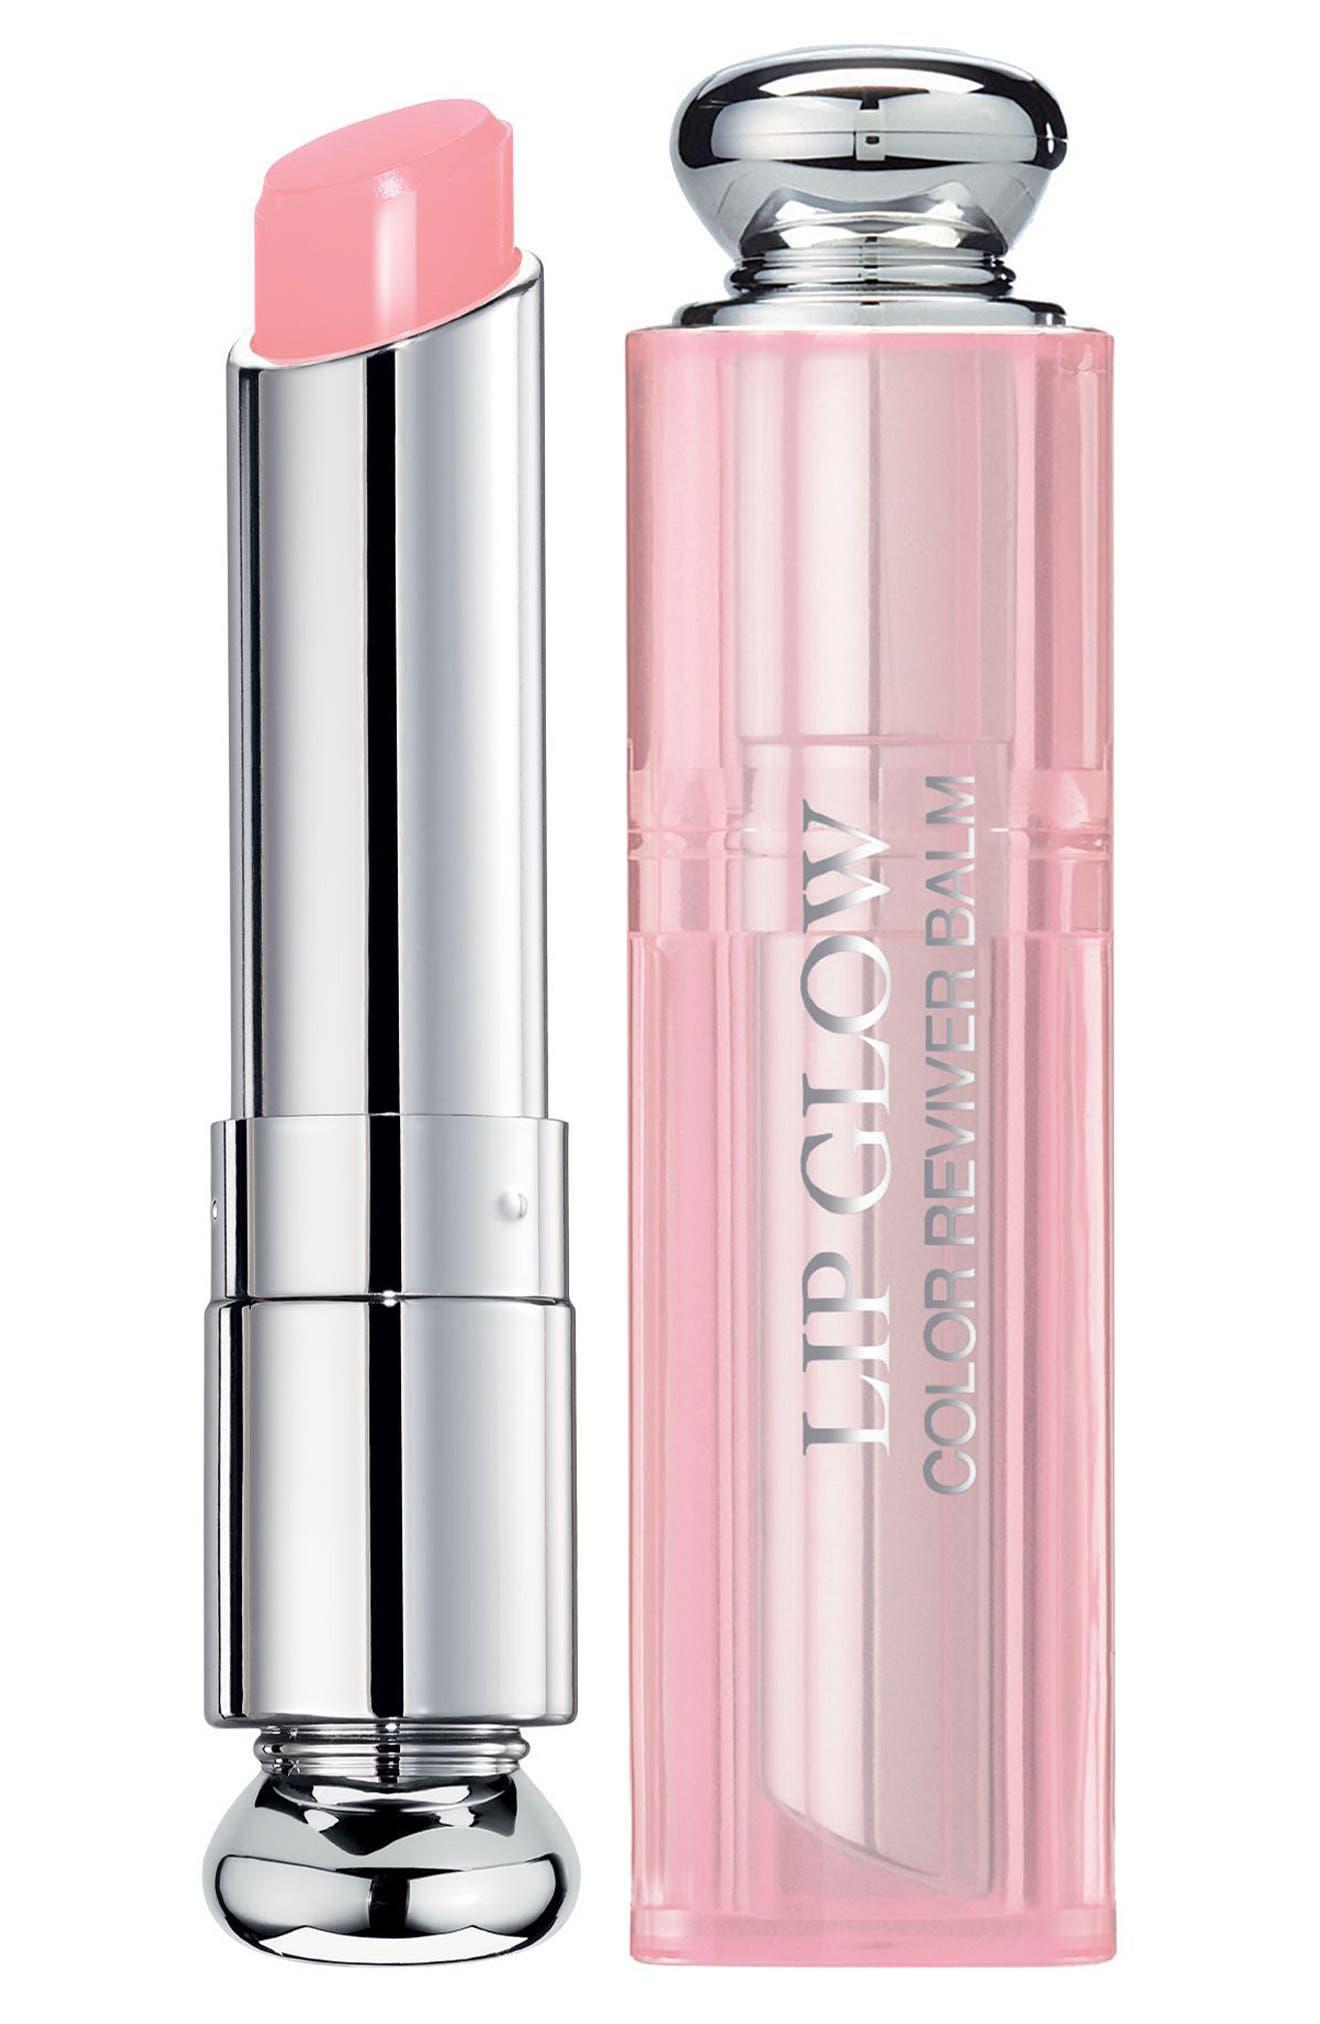 DIOR, Addict Lip Glow Color Reviving Lip Balm, Main thumbnail 1, color, 001 PINK / GLOW